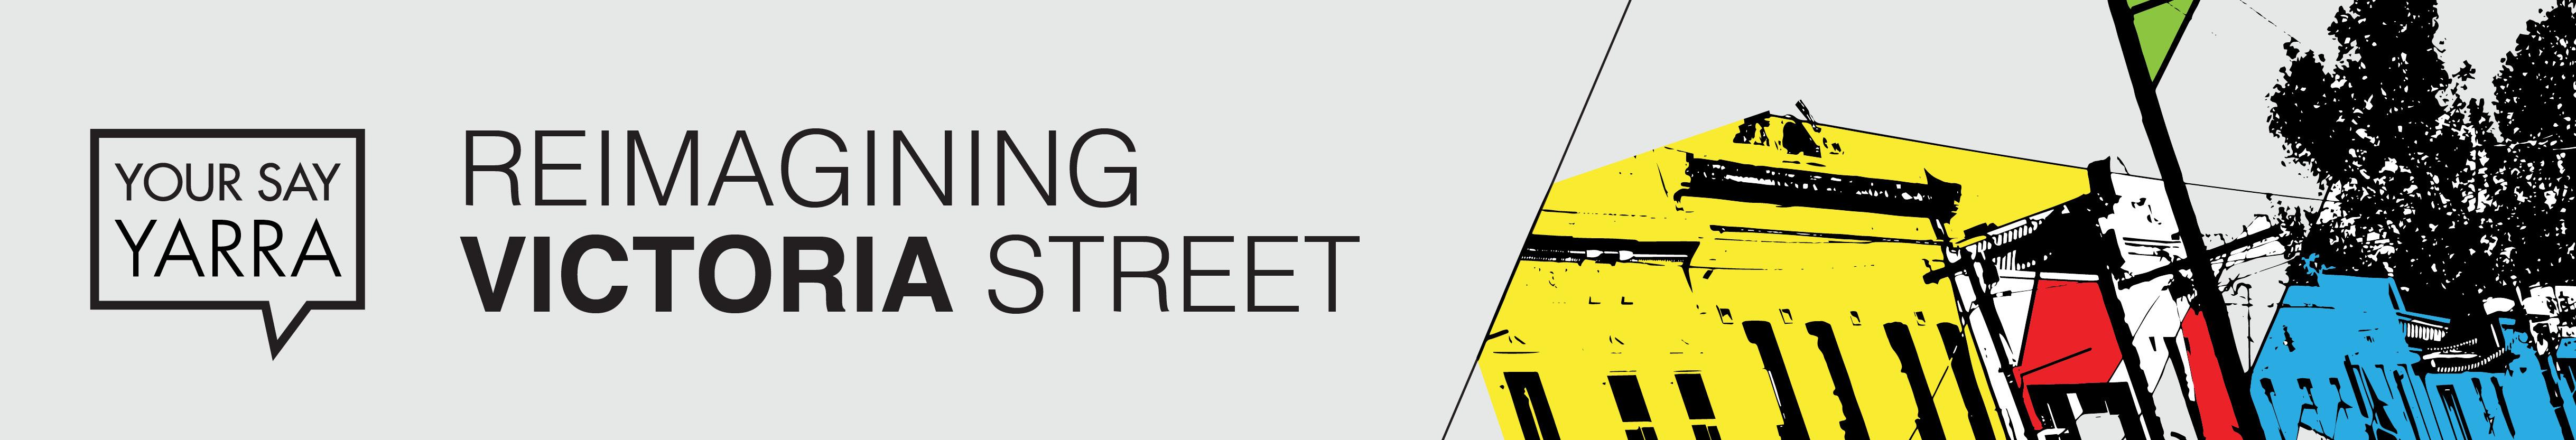 Reimagining Victoria Street